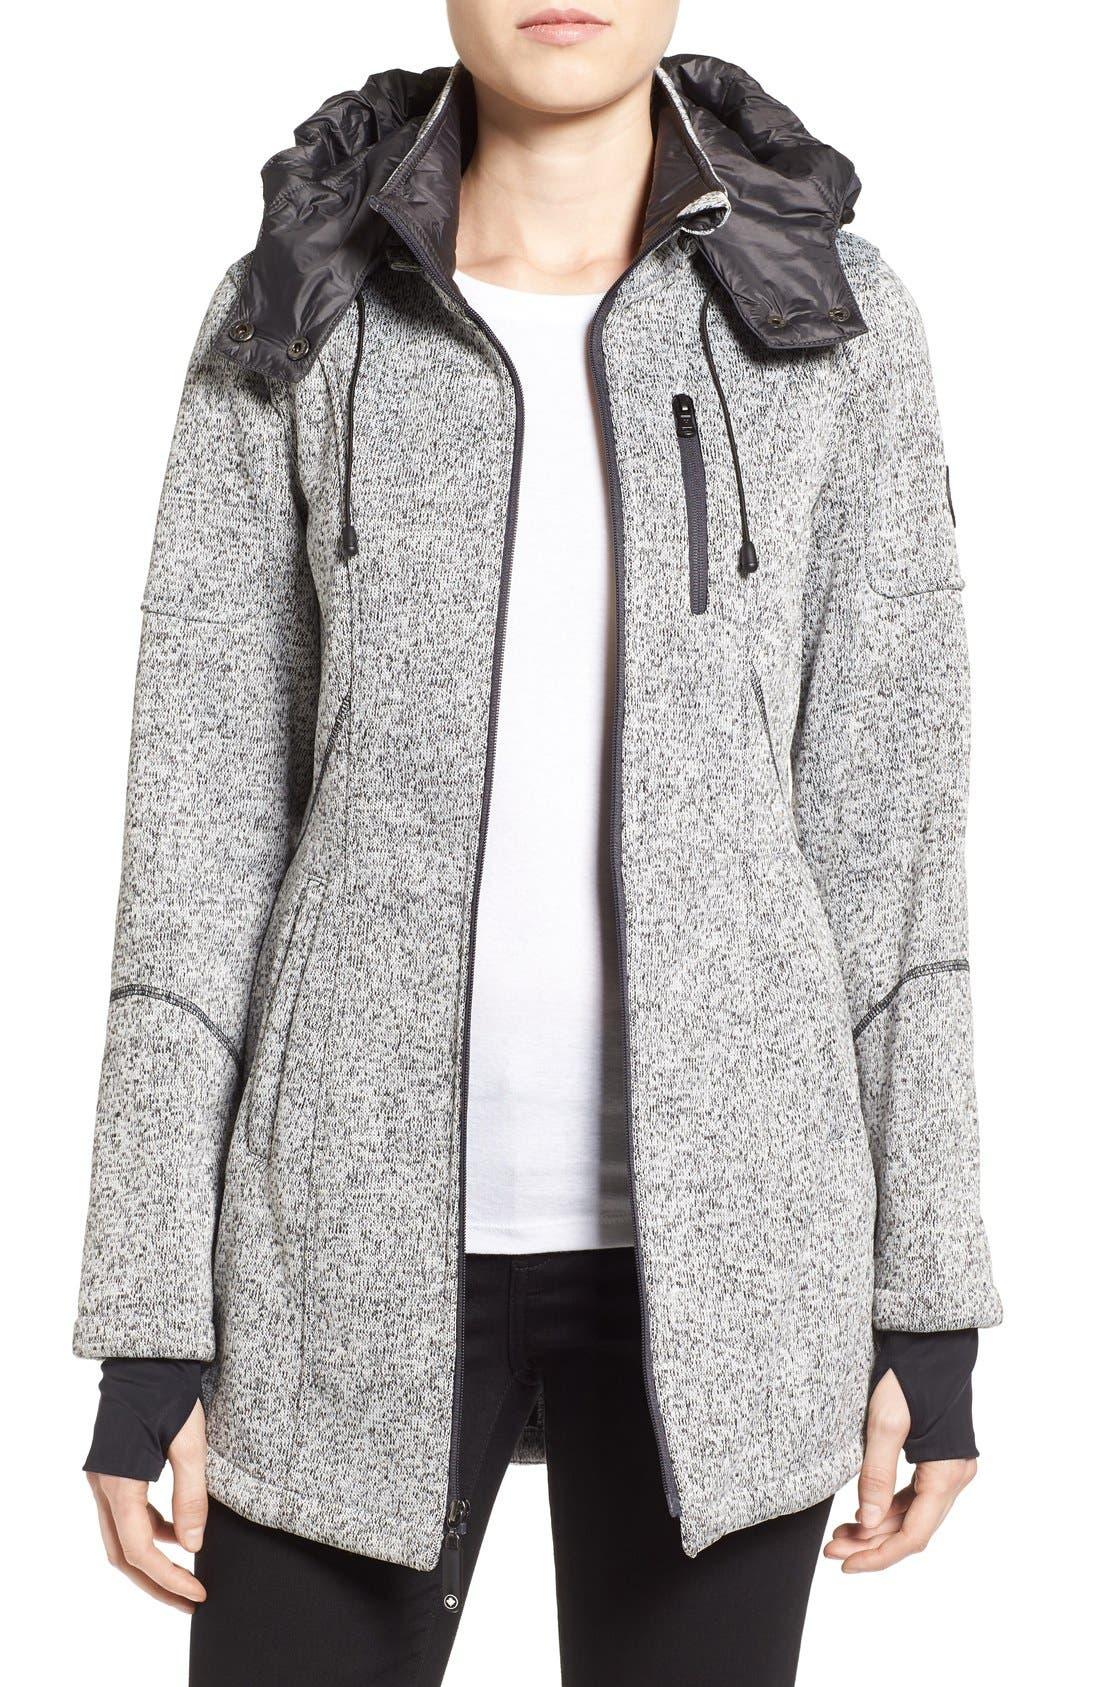 Bonded Knit Zip Front Jacket,                             Main thumbnail 1, color,                             070